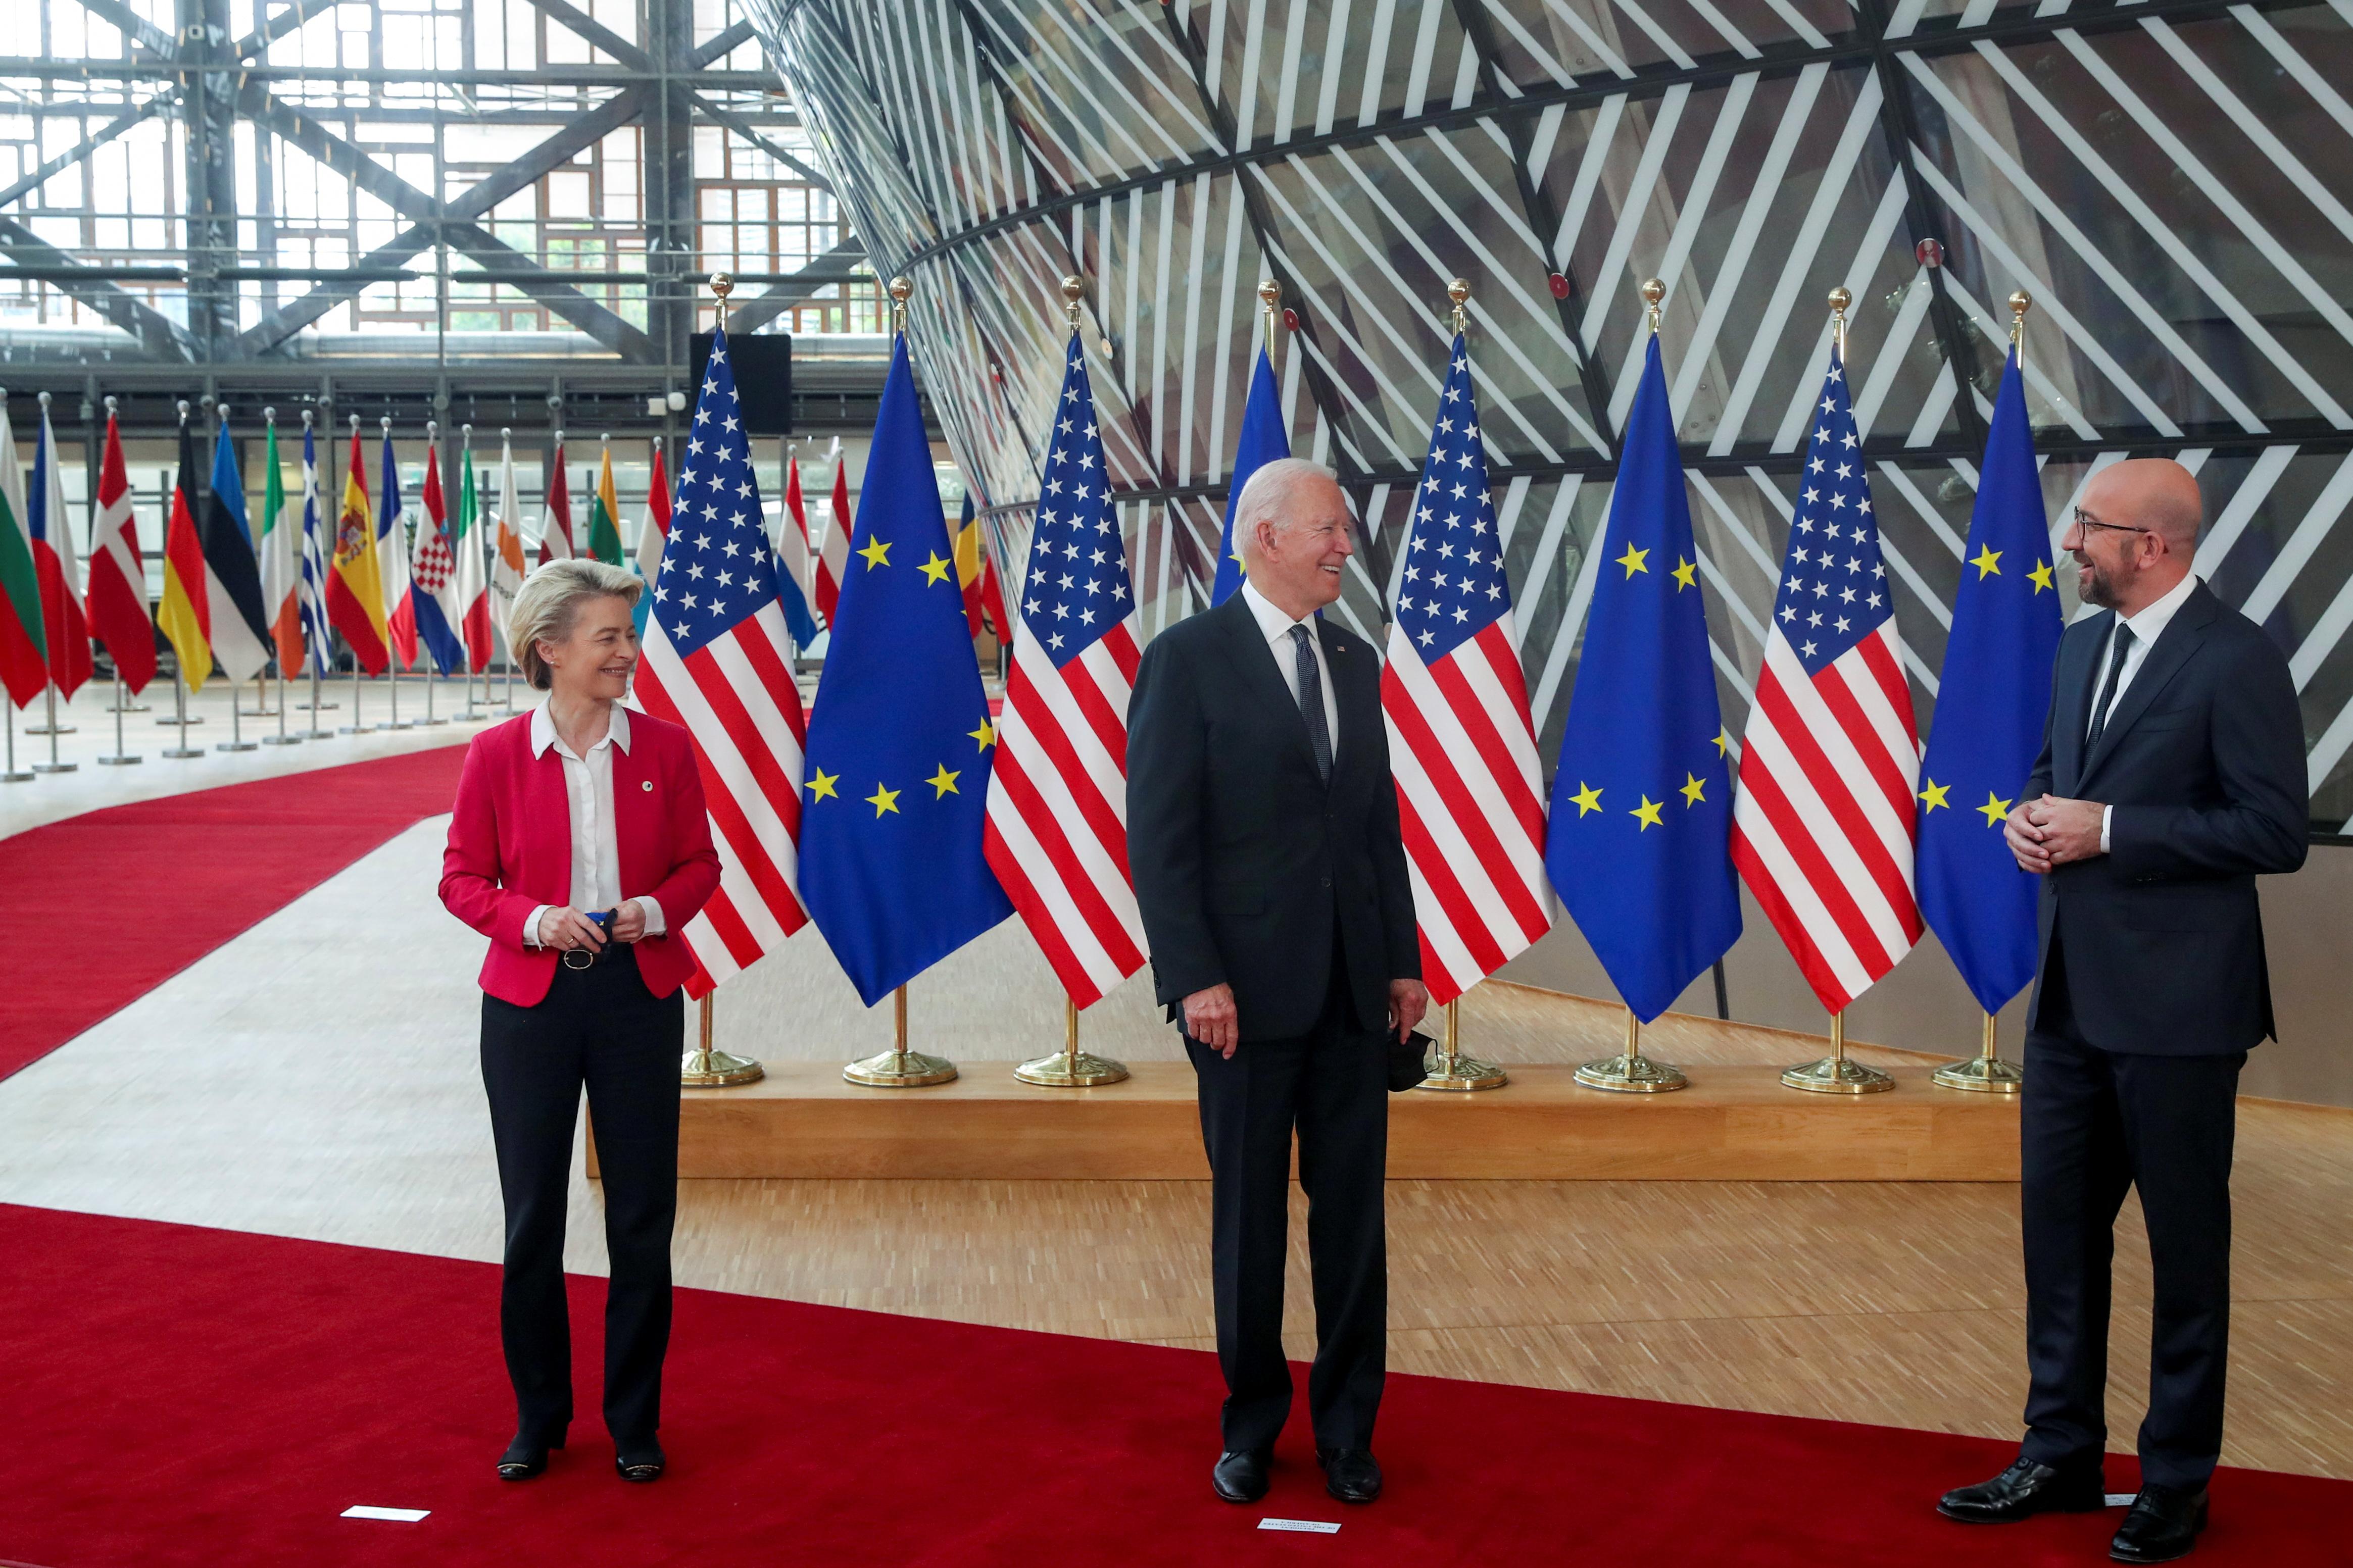 European Council President Charles Michel and European Commission President Ursula von der Leyen pose with U.S. President Joe Biden during the EU-US summit, in Brussels, Belgium June 15, 2021. REUTERS/Yves Herman